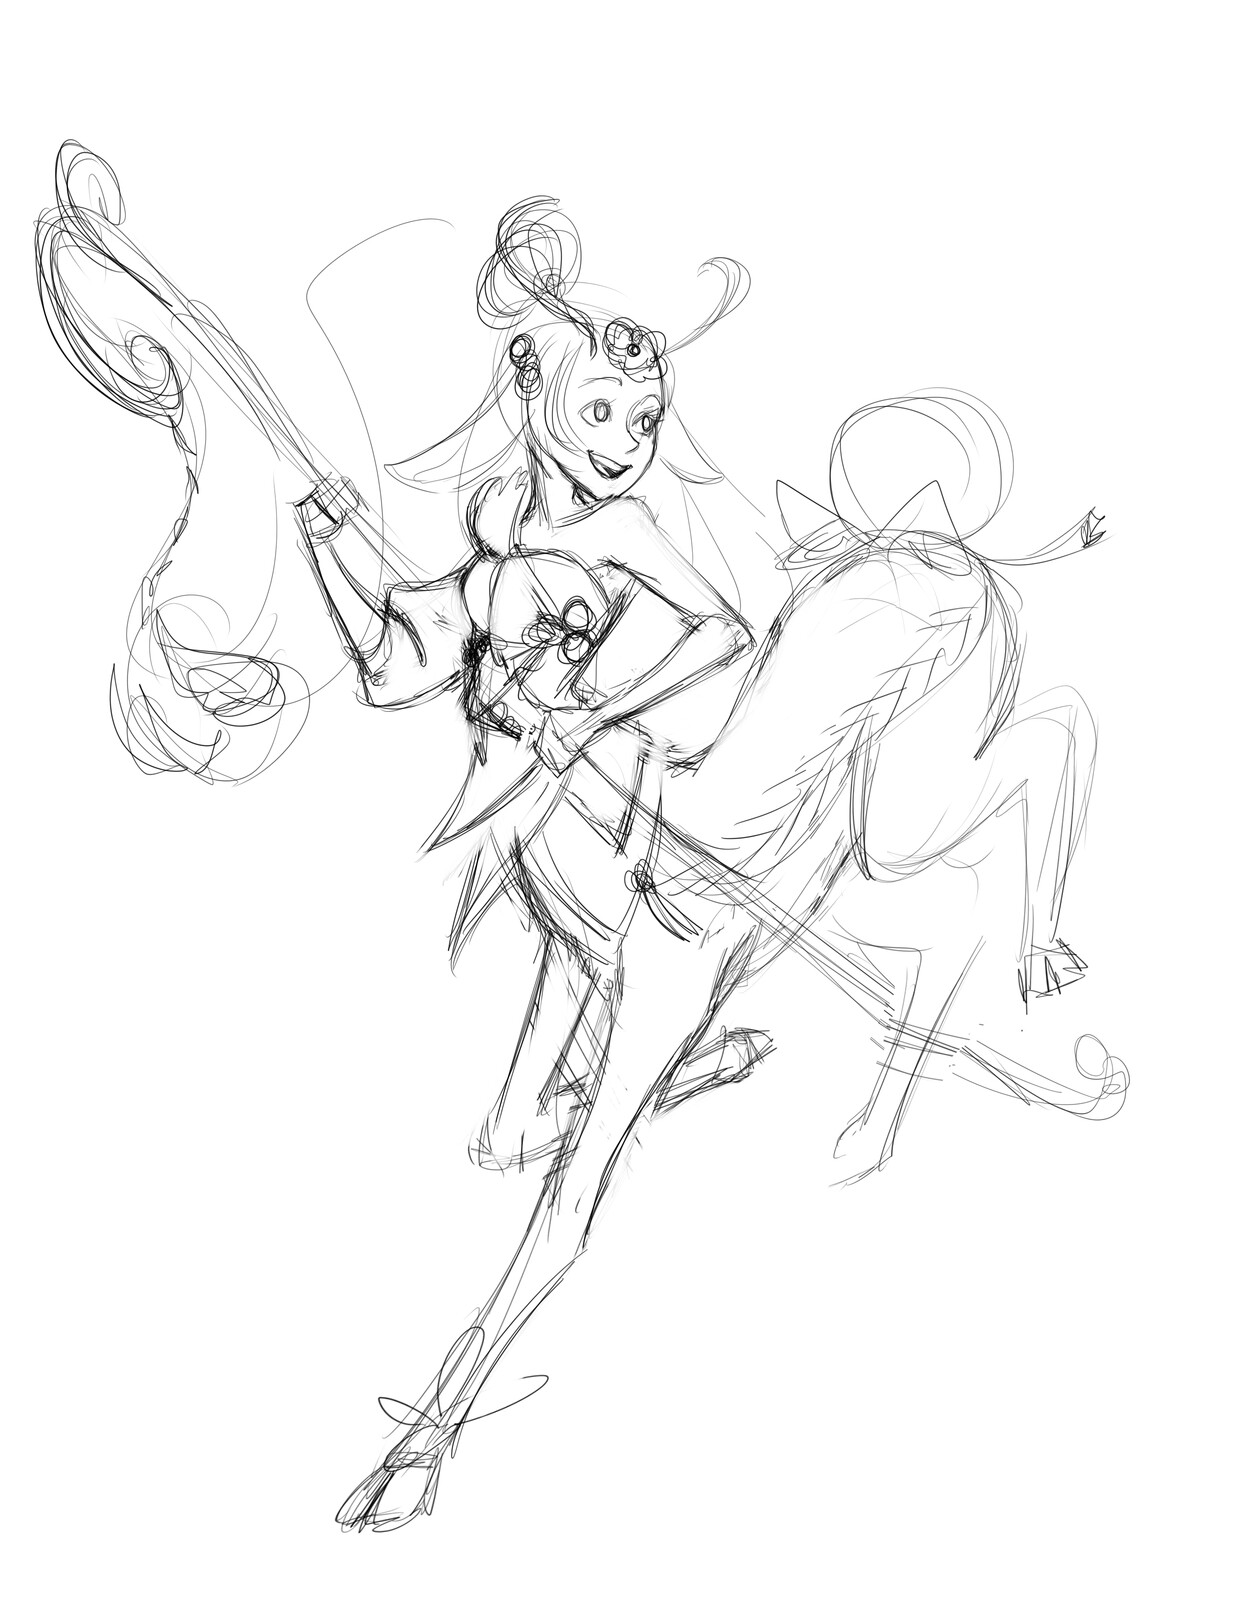 first rough sketch